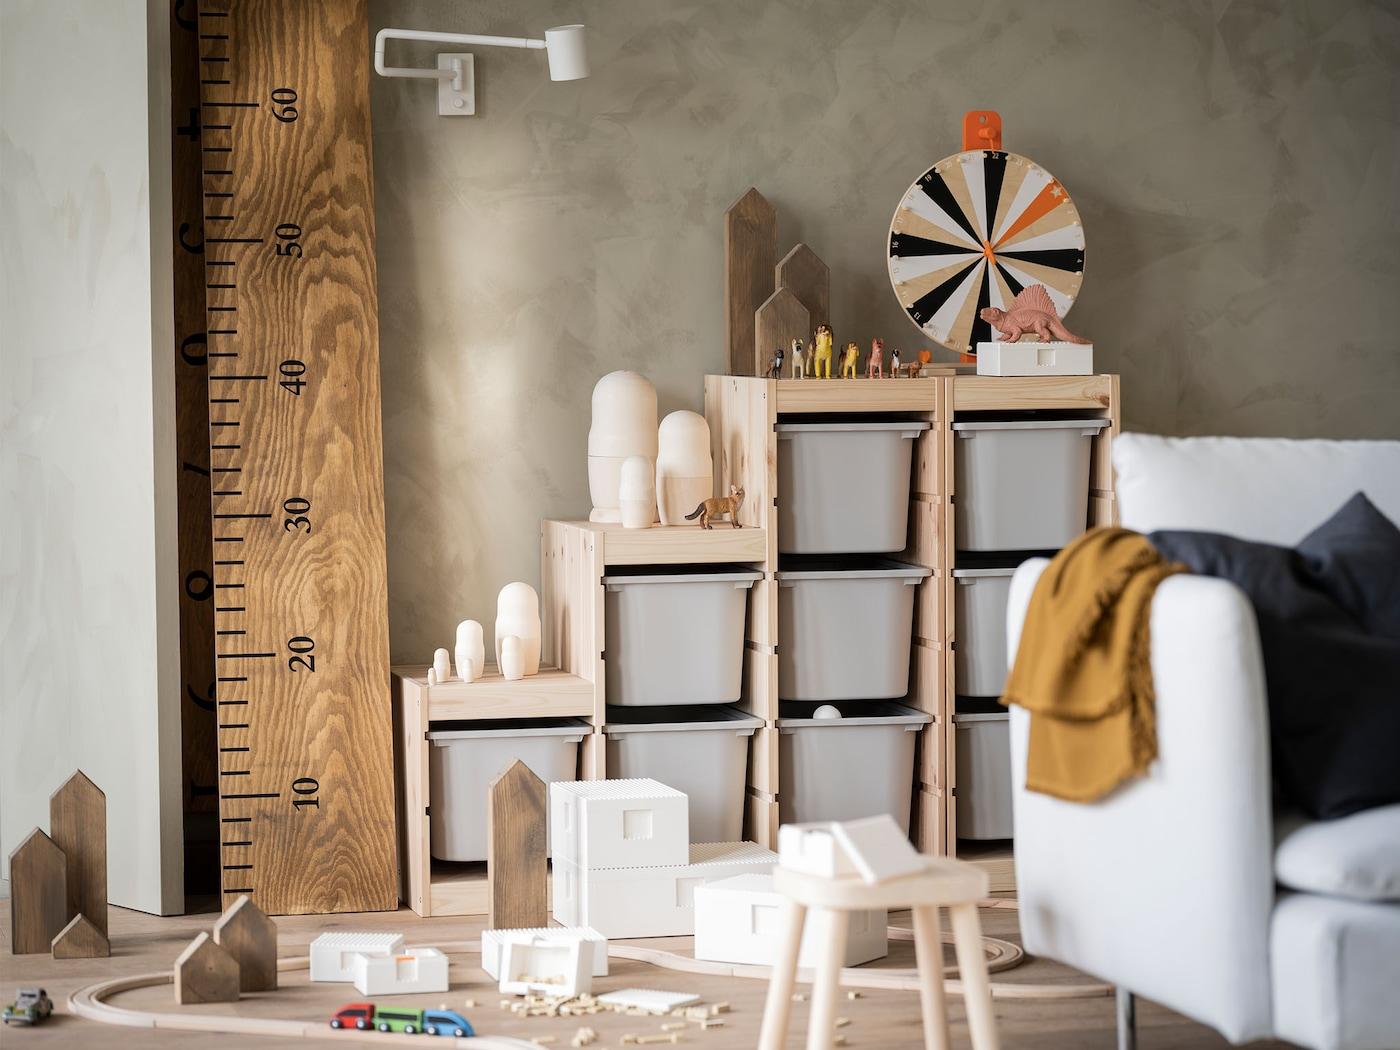 Children's room - IKEA Home Furnishings Malaysia